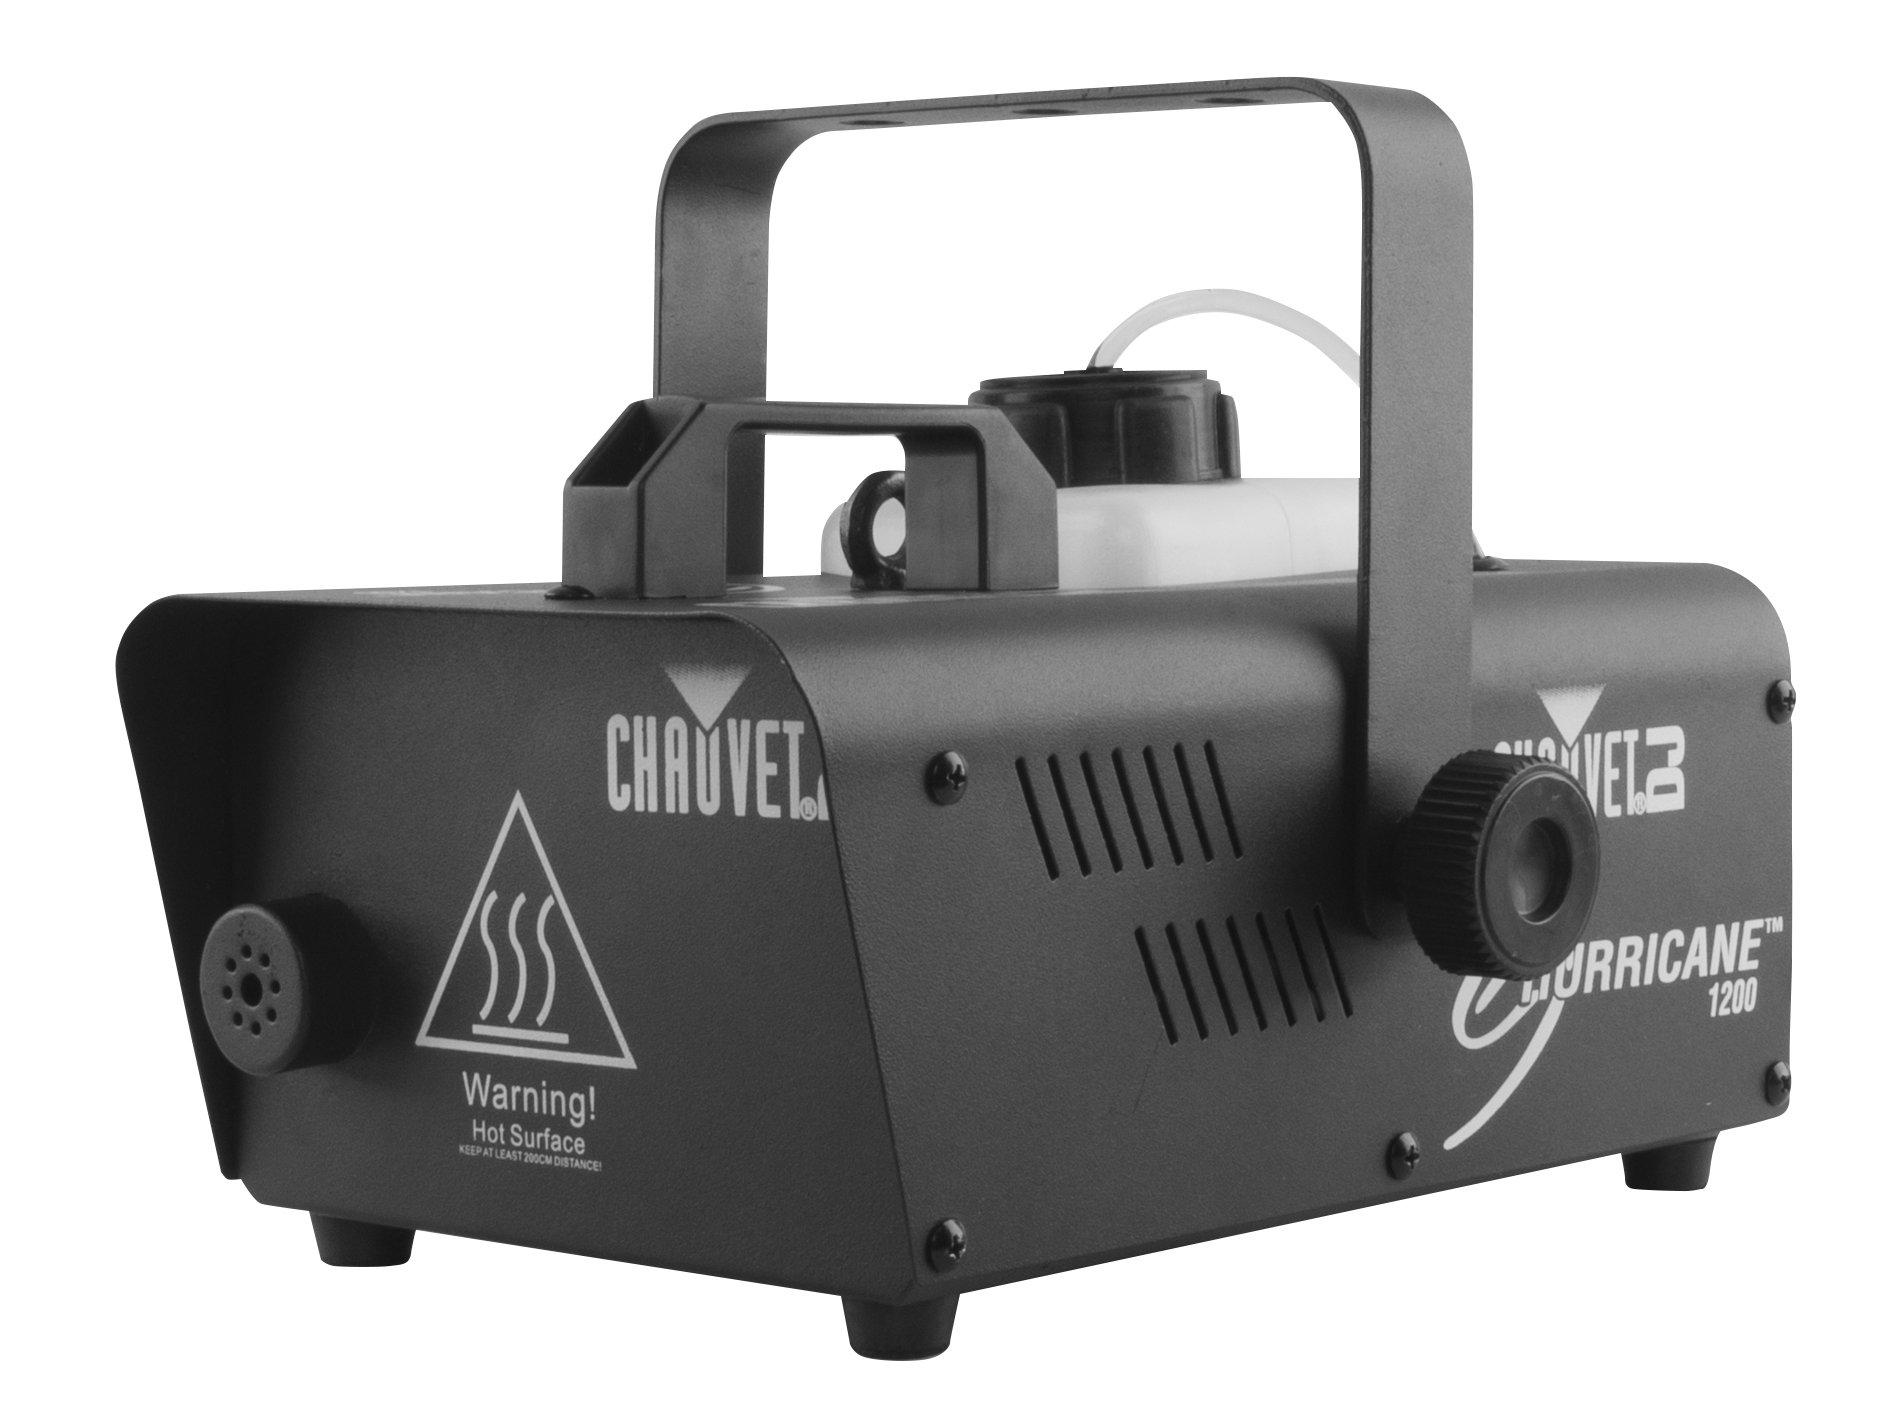 CHAUVET DJ H1200 Compact and Lightweight Fog Machine w/Timer Remote by CHAUVET DJ (Image #4)